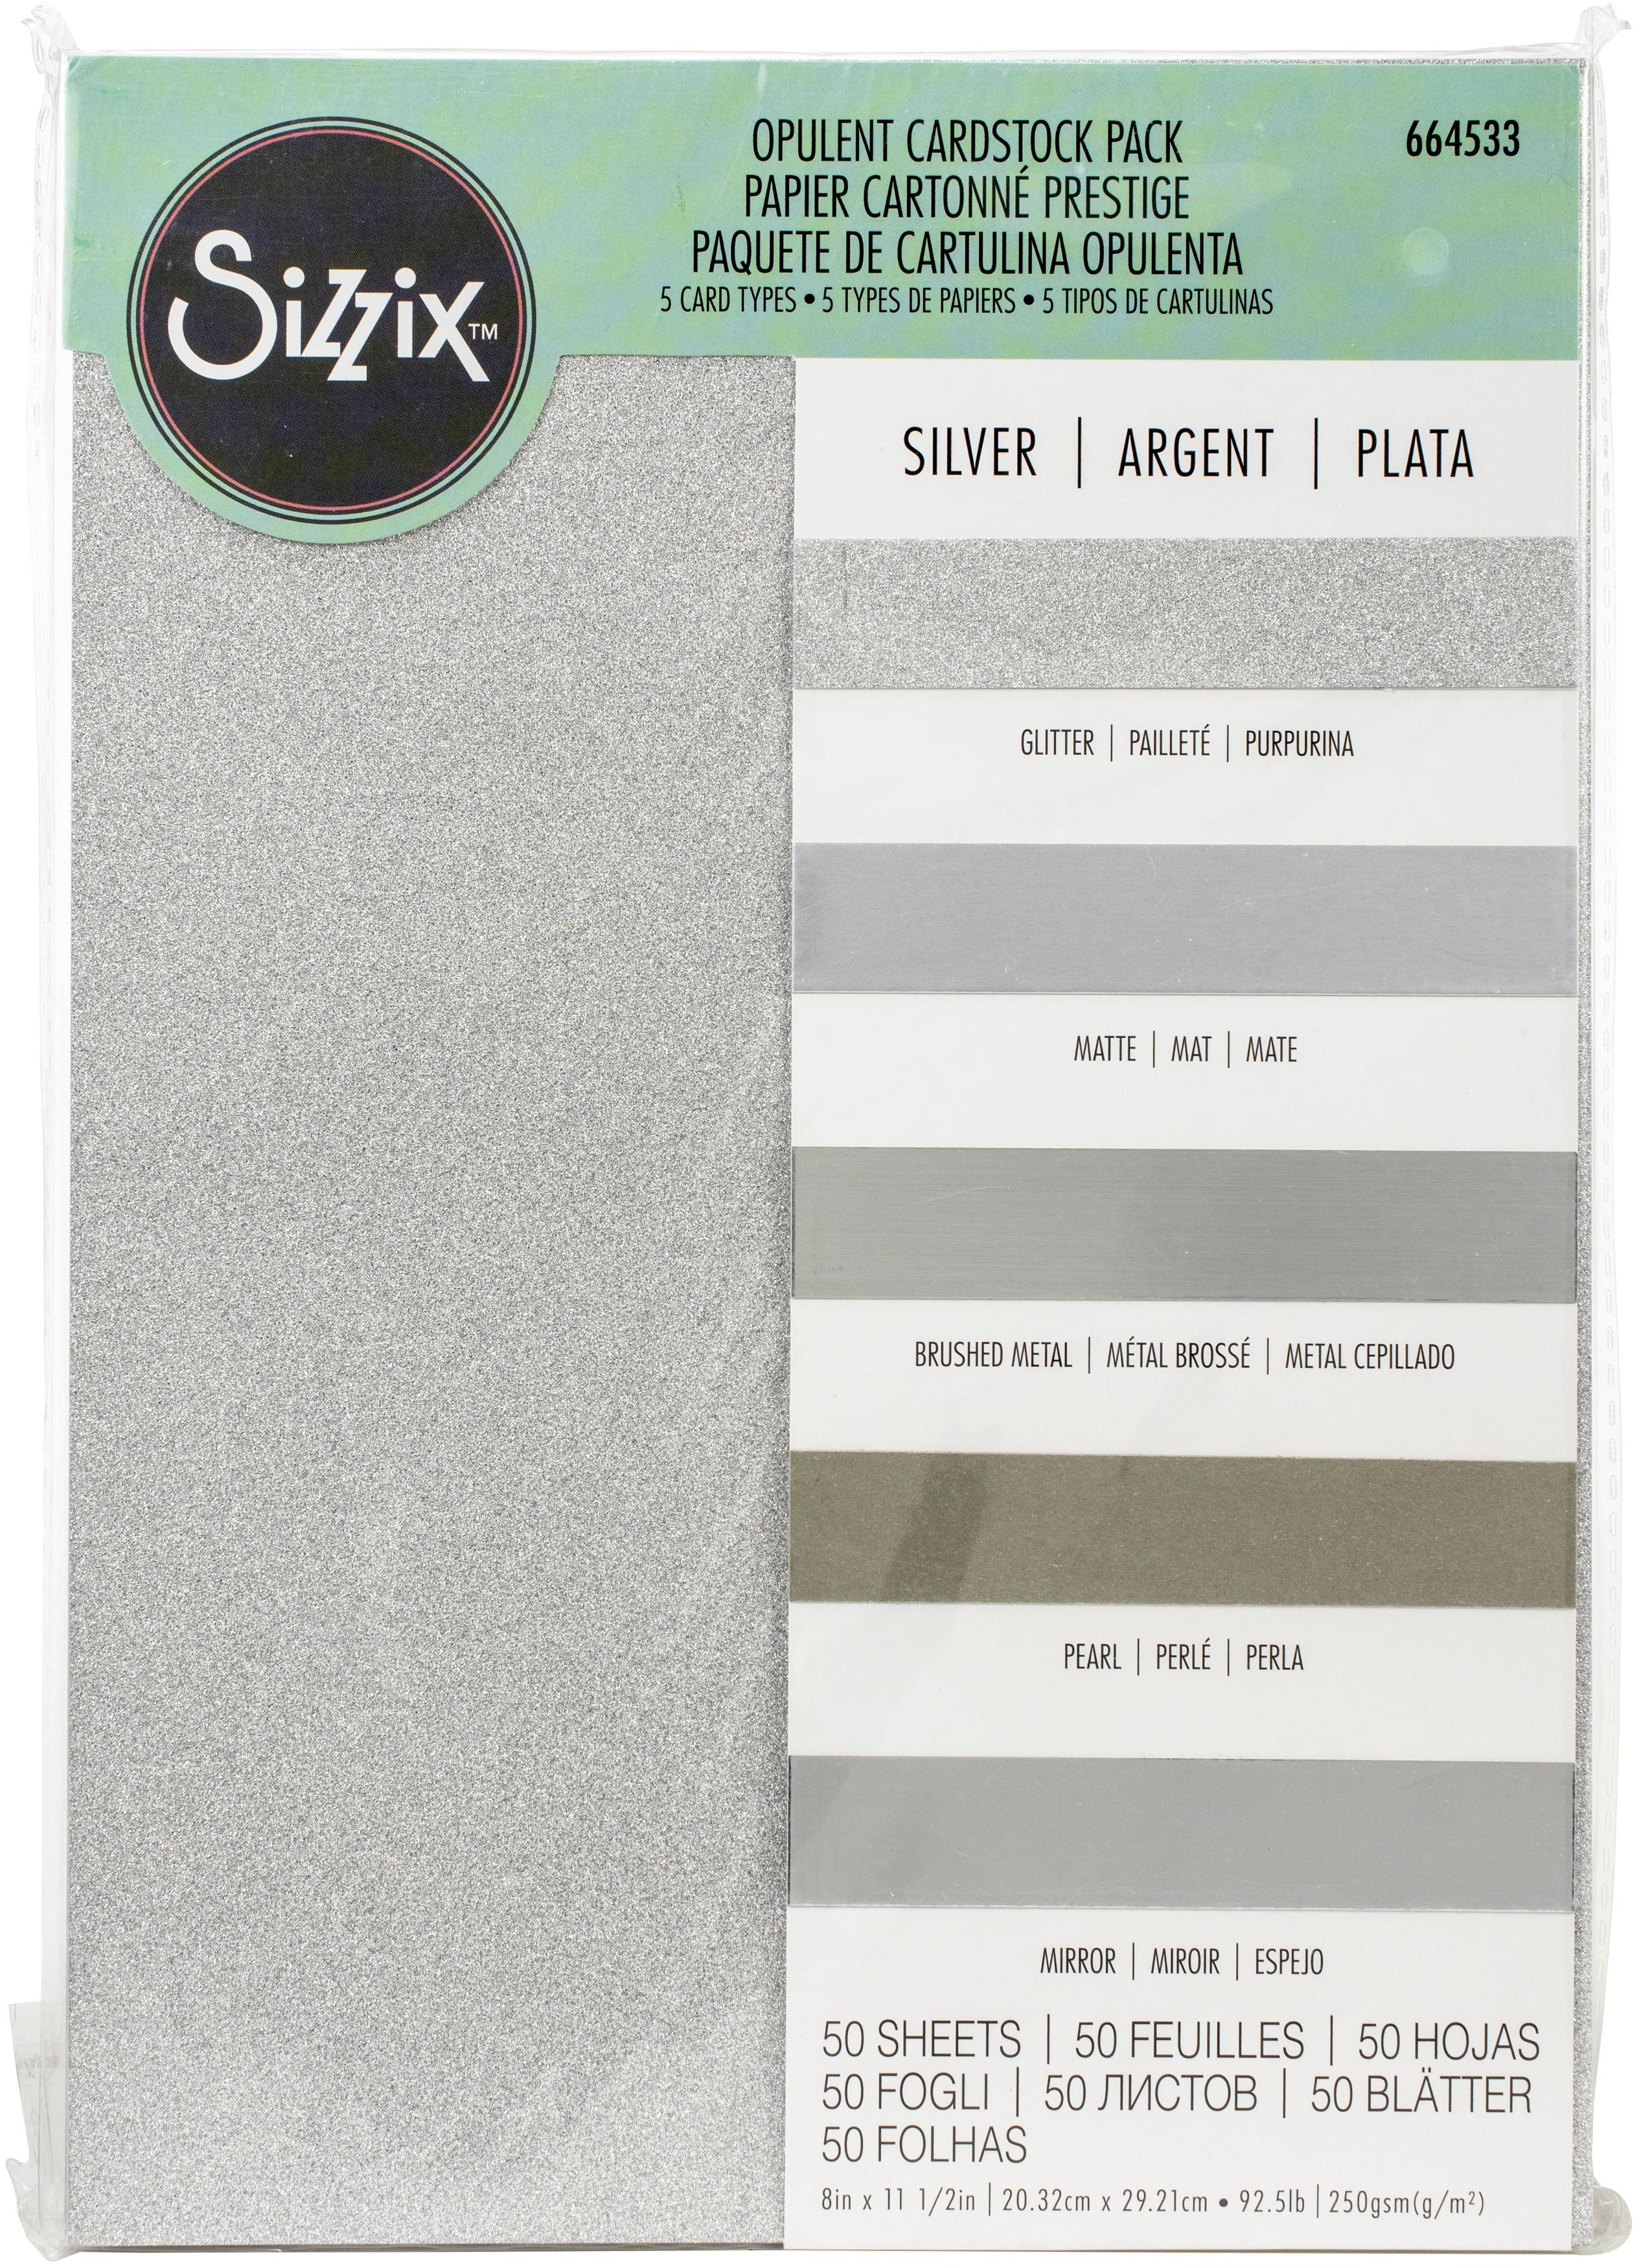 Sizzix Surfacez Opulent Cardstock Pack 8X11.5 50/Pkg-Silver